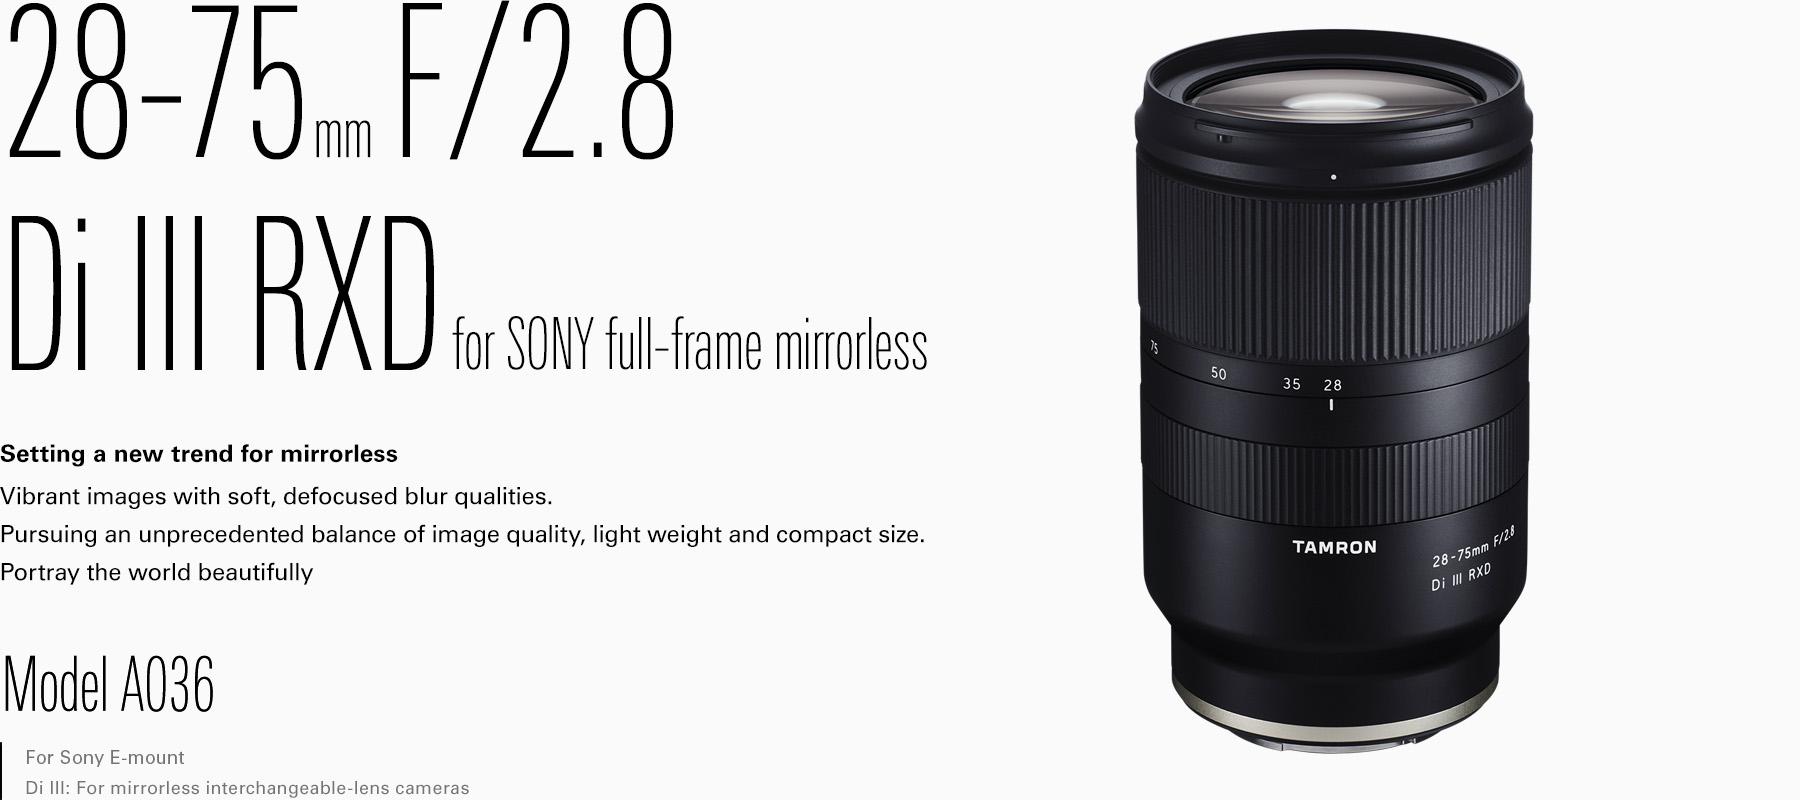 Ausgezeichnet Full Frame E Mount Objektive Ideen ...